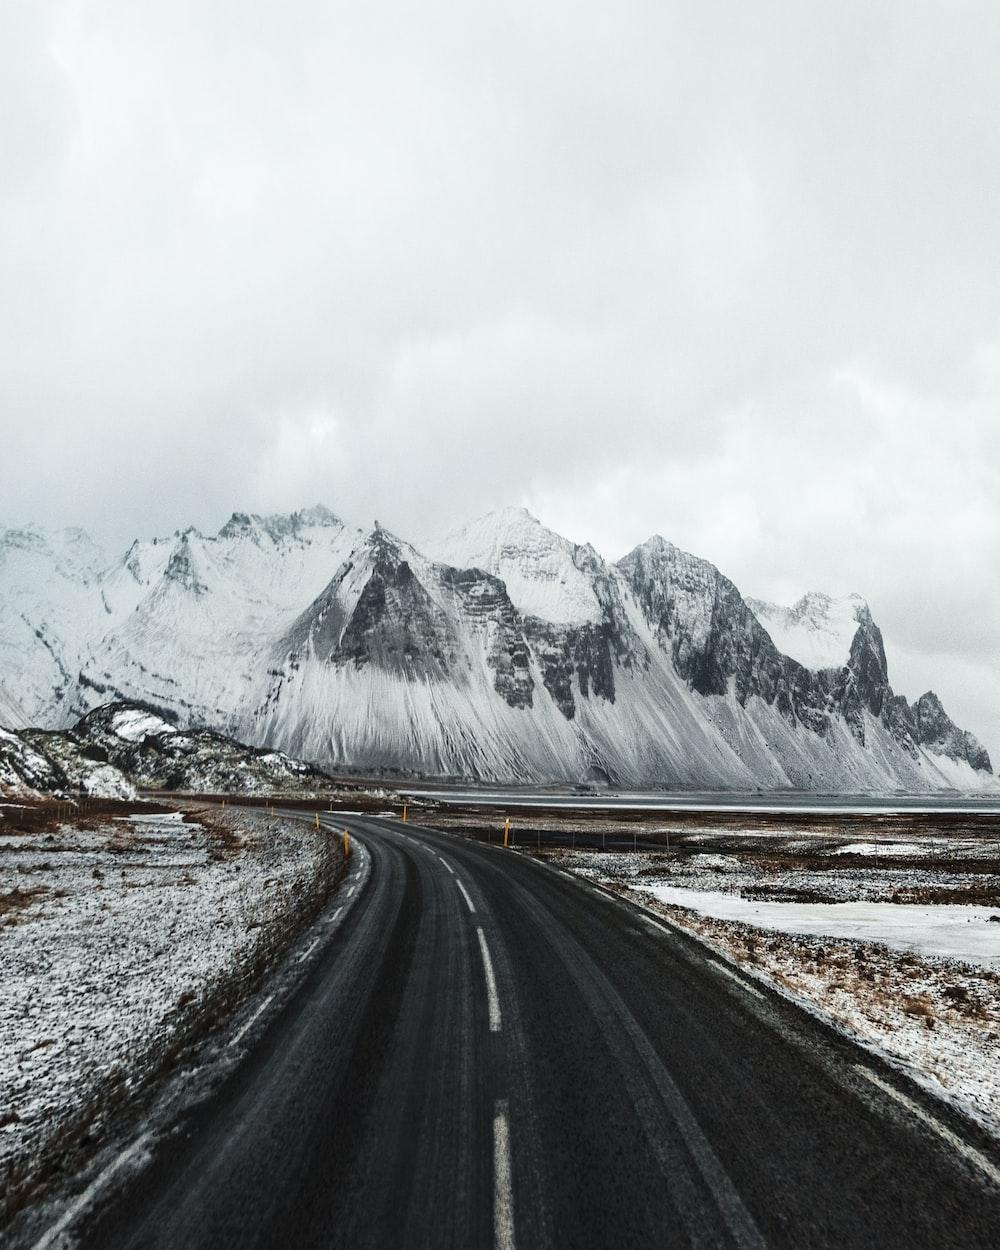 black-paved road